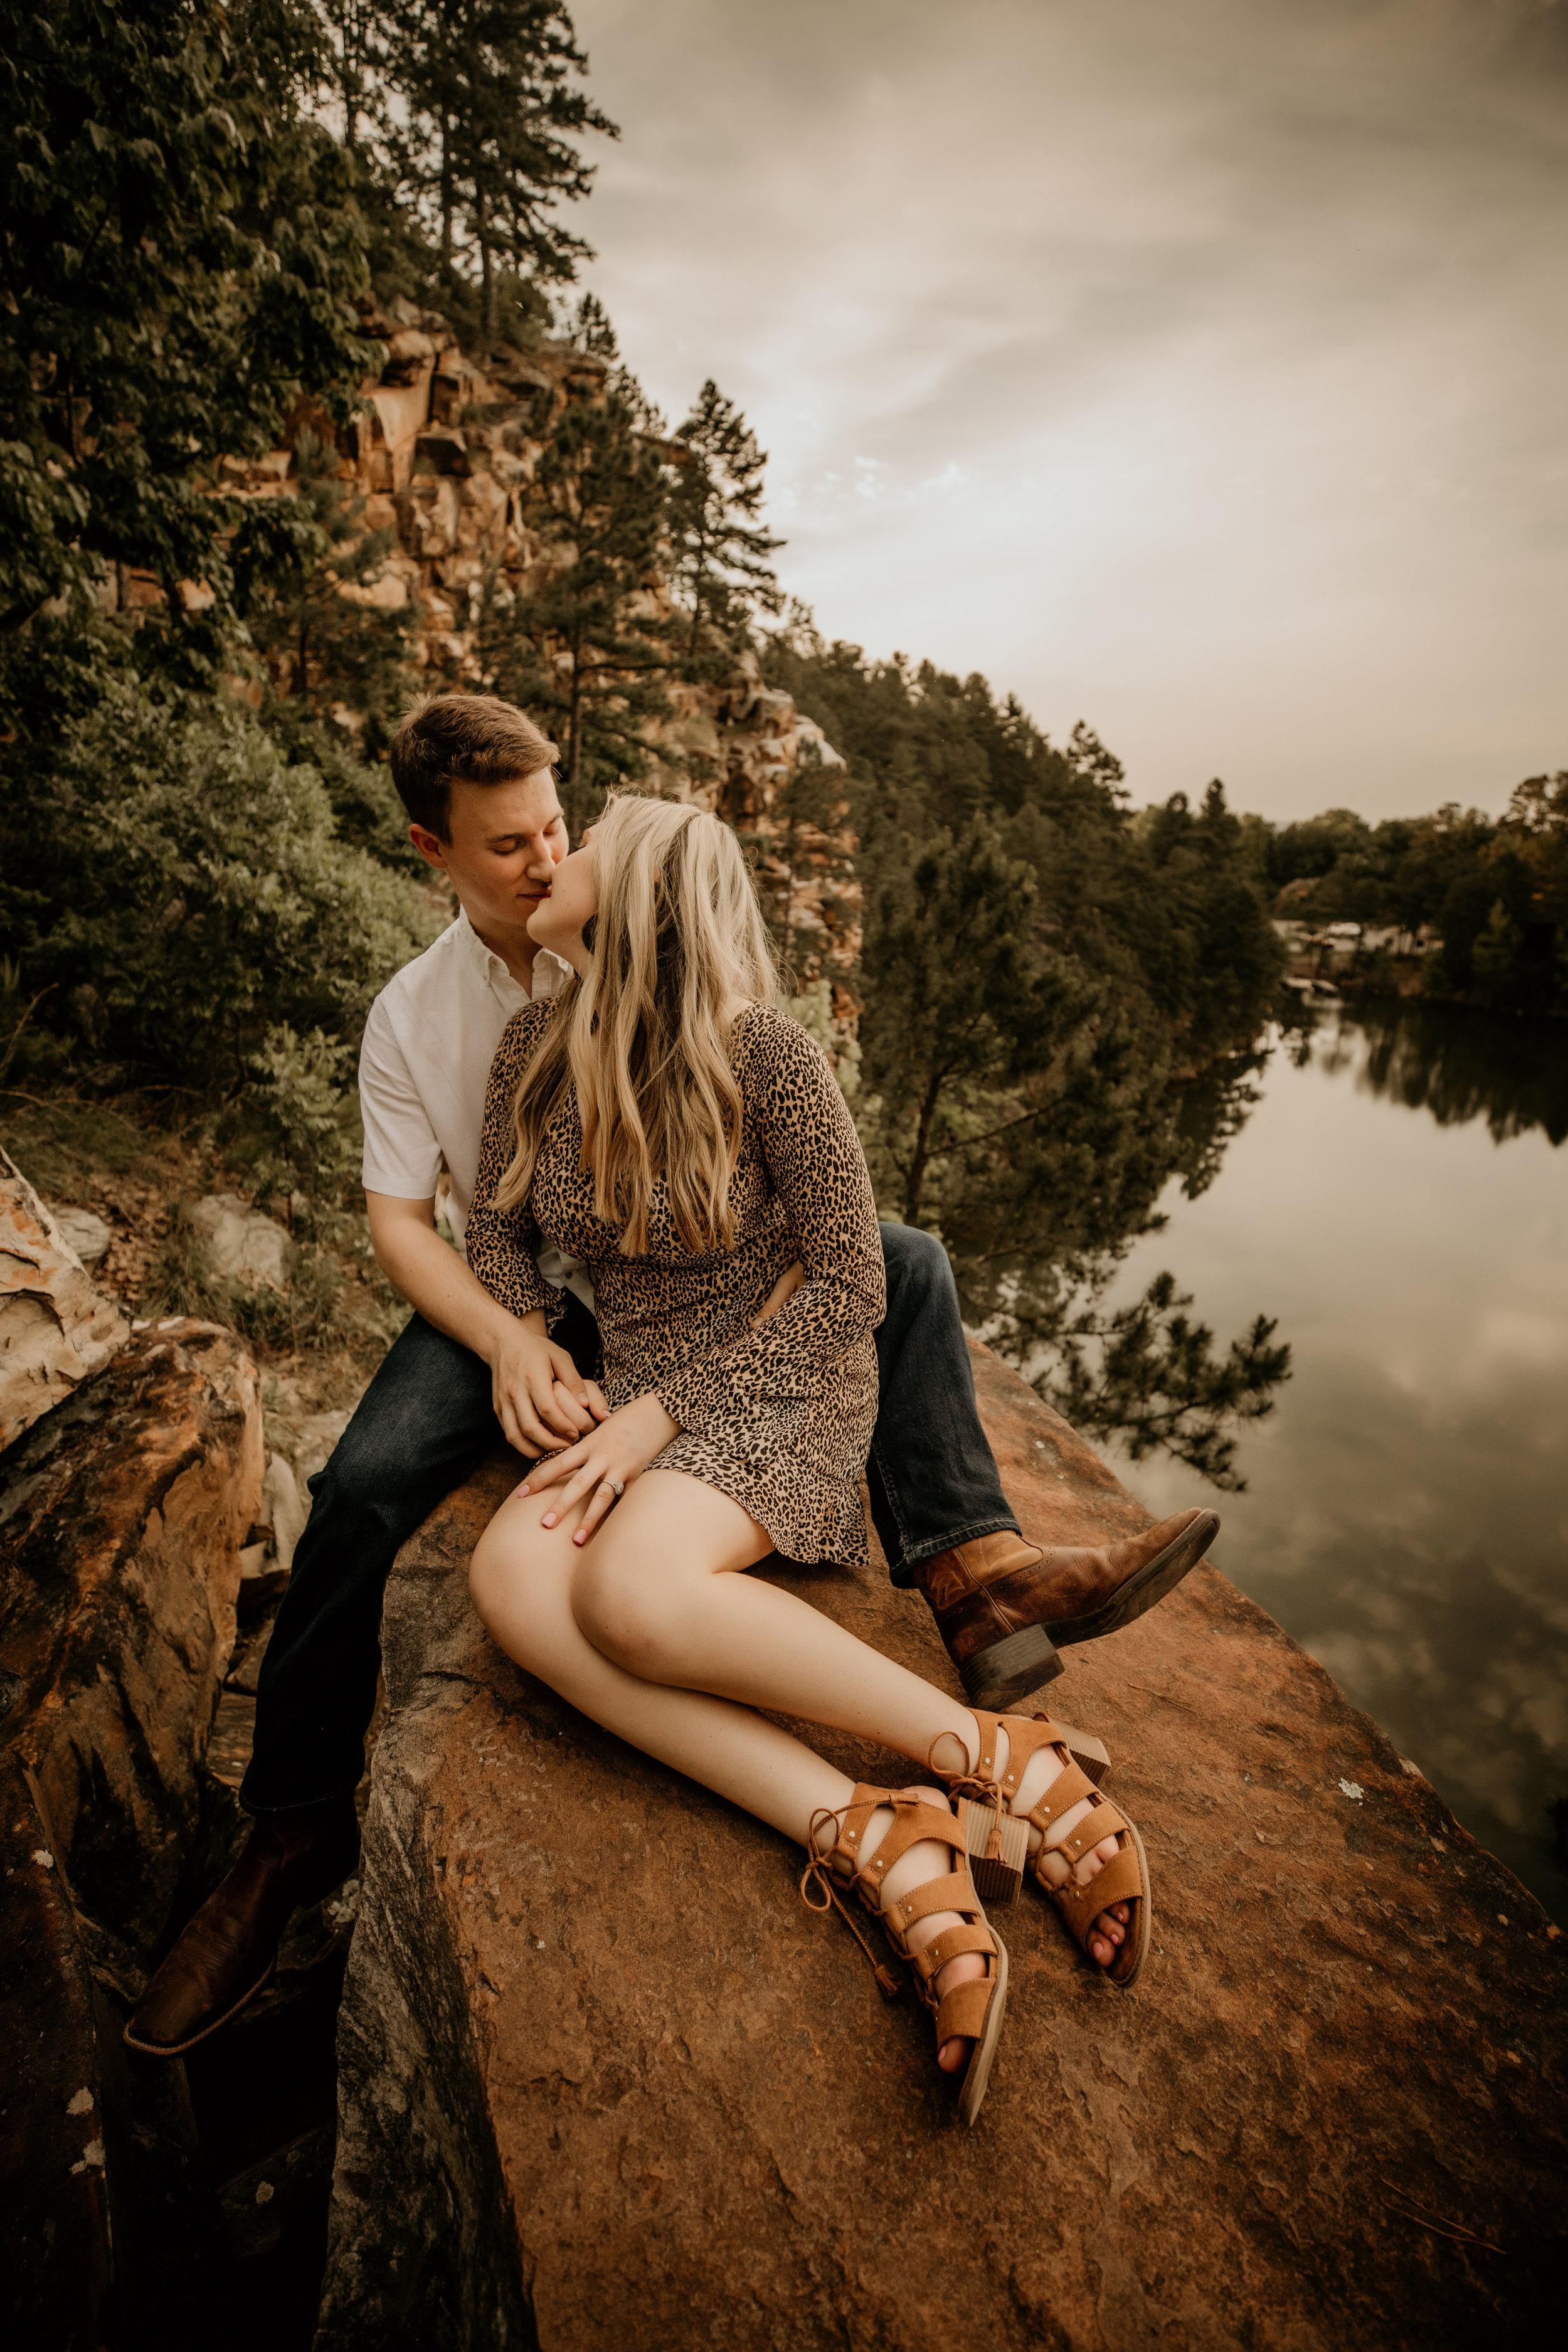 pinnacle-mountain-wedding-elopement-little-rock-arkansas-photographer-erin-venable-photography-bride-engagement-6980.jpg